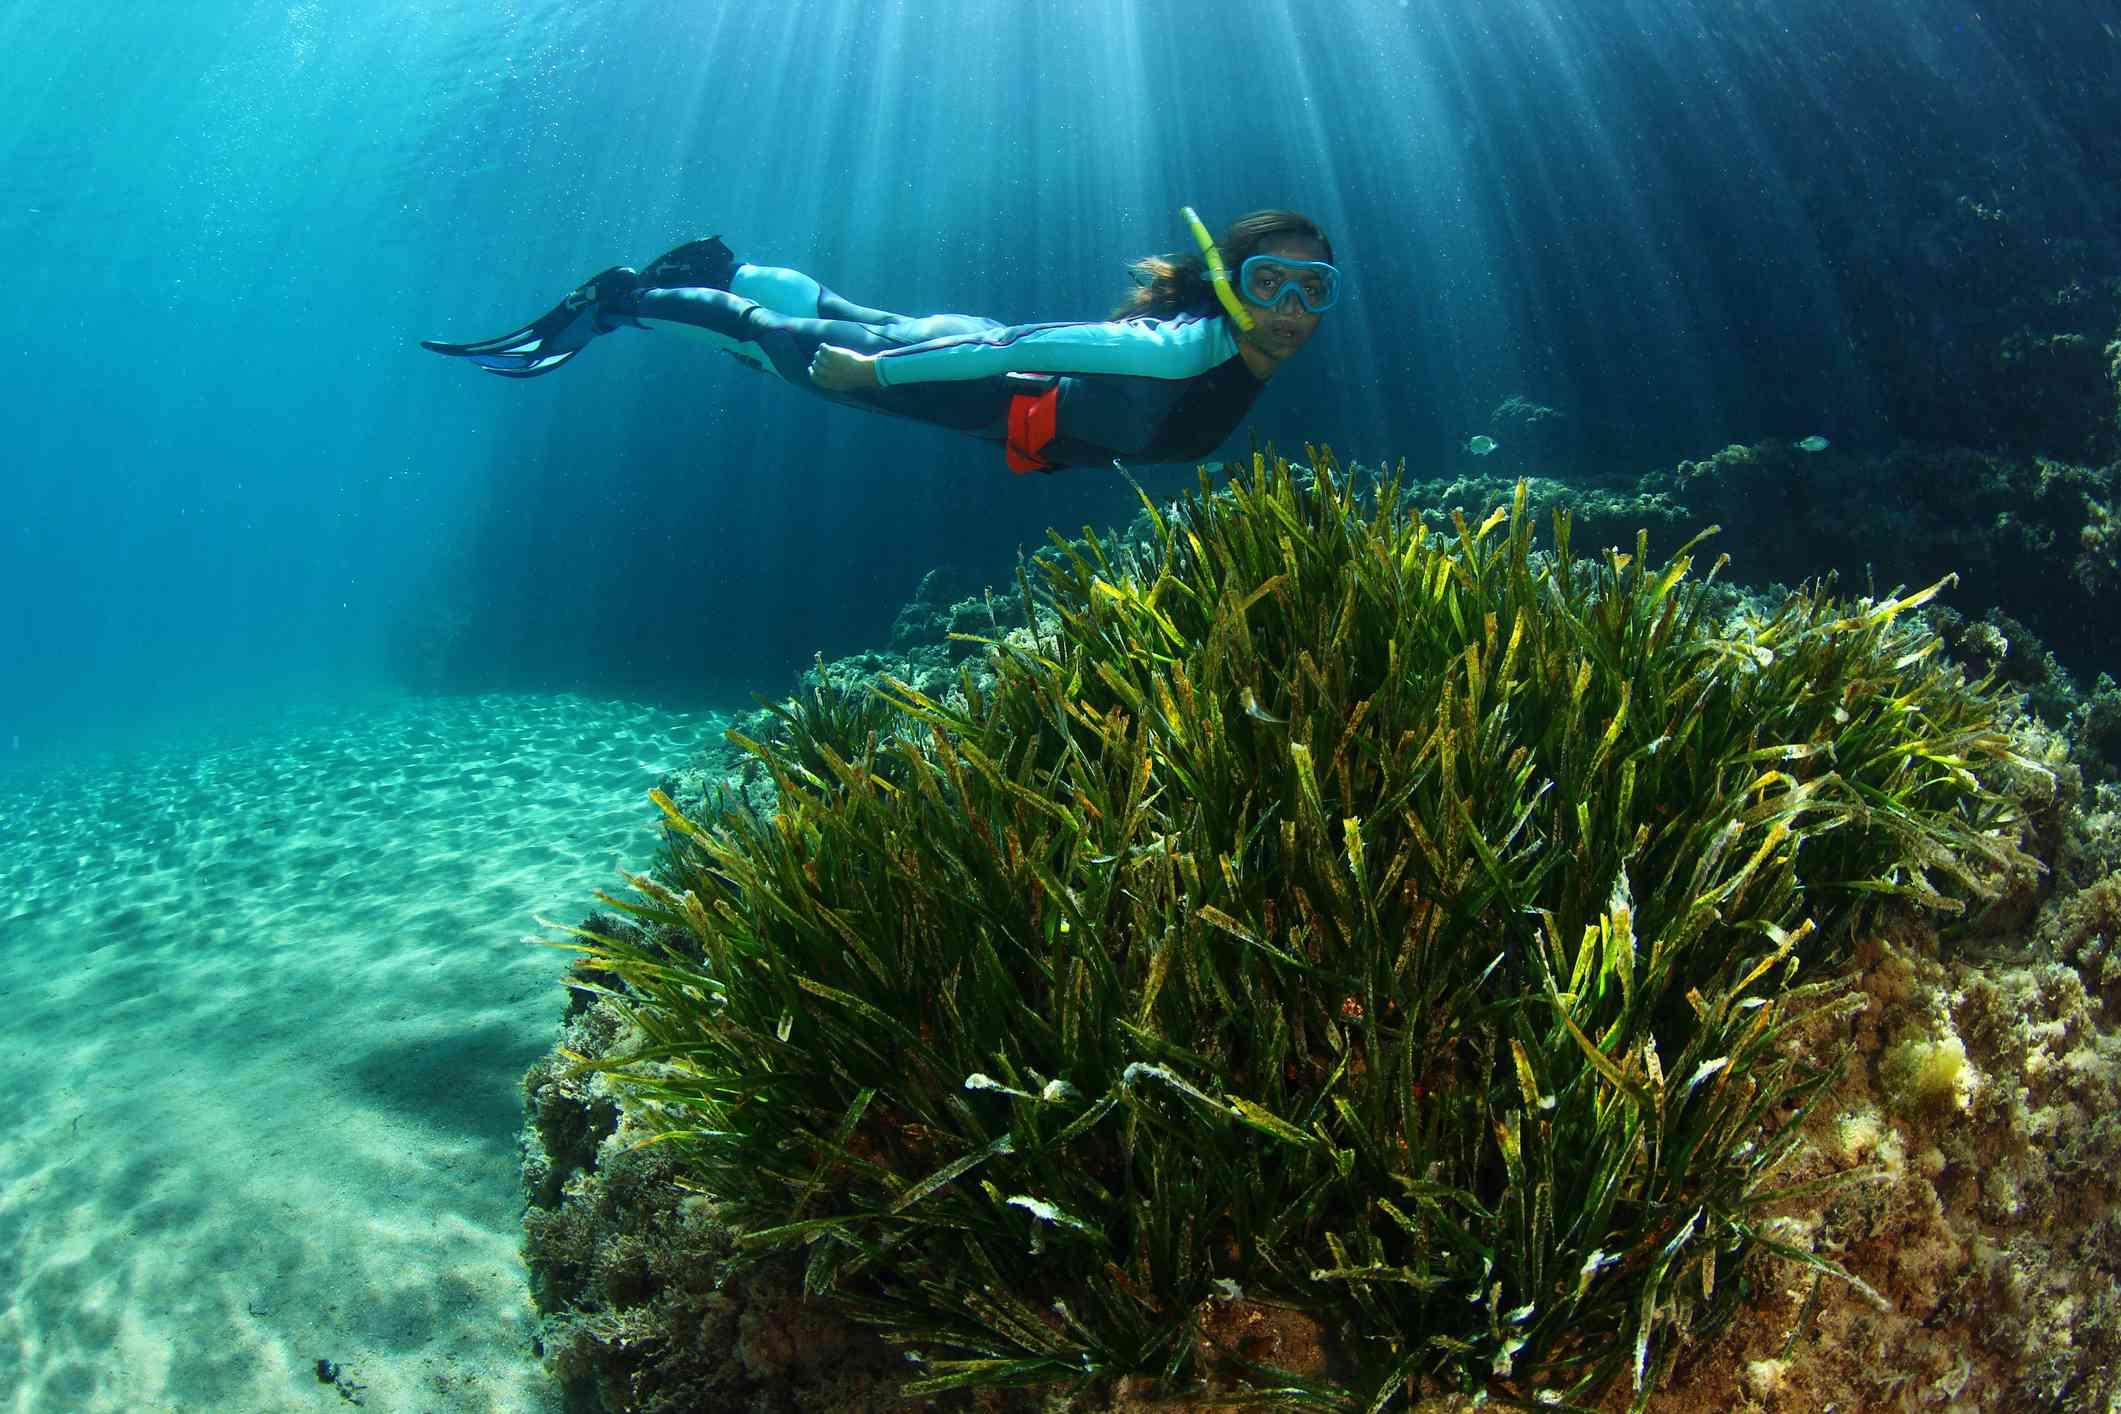 Snorkeler swimming near large posidonia